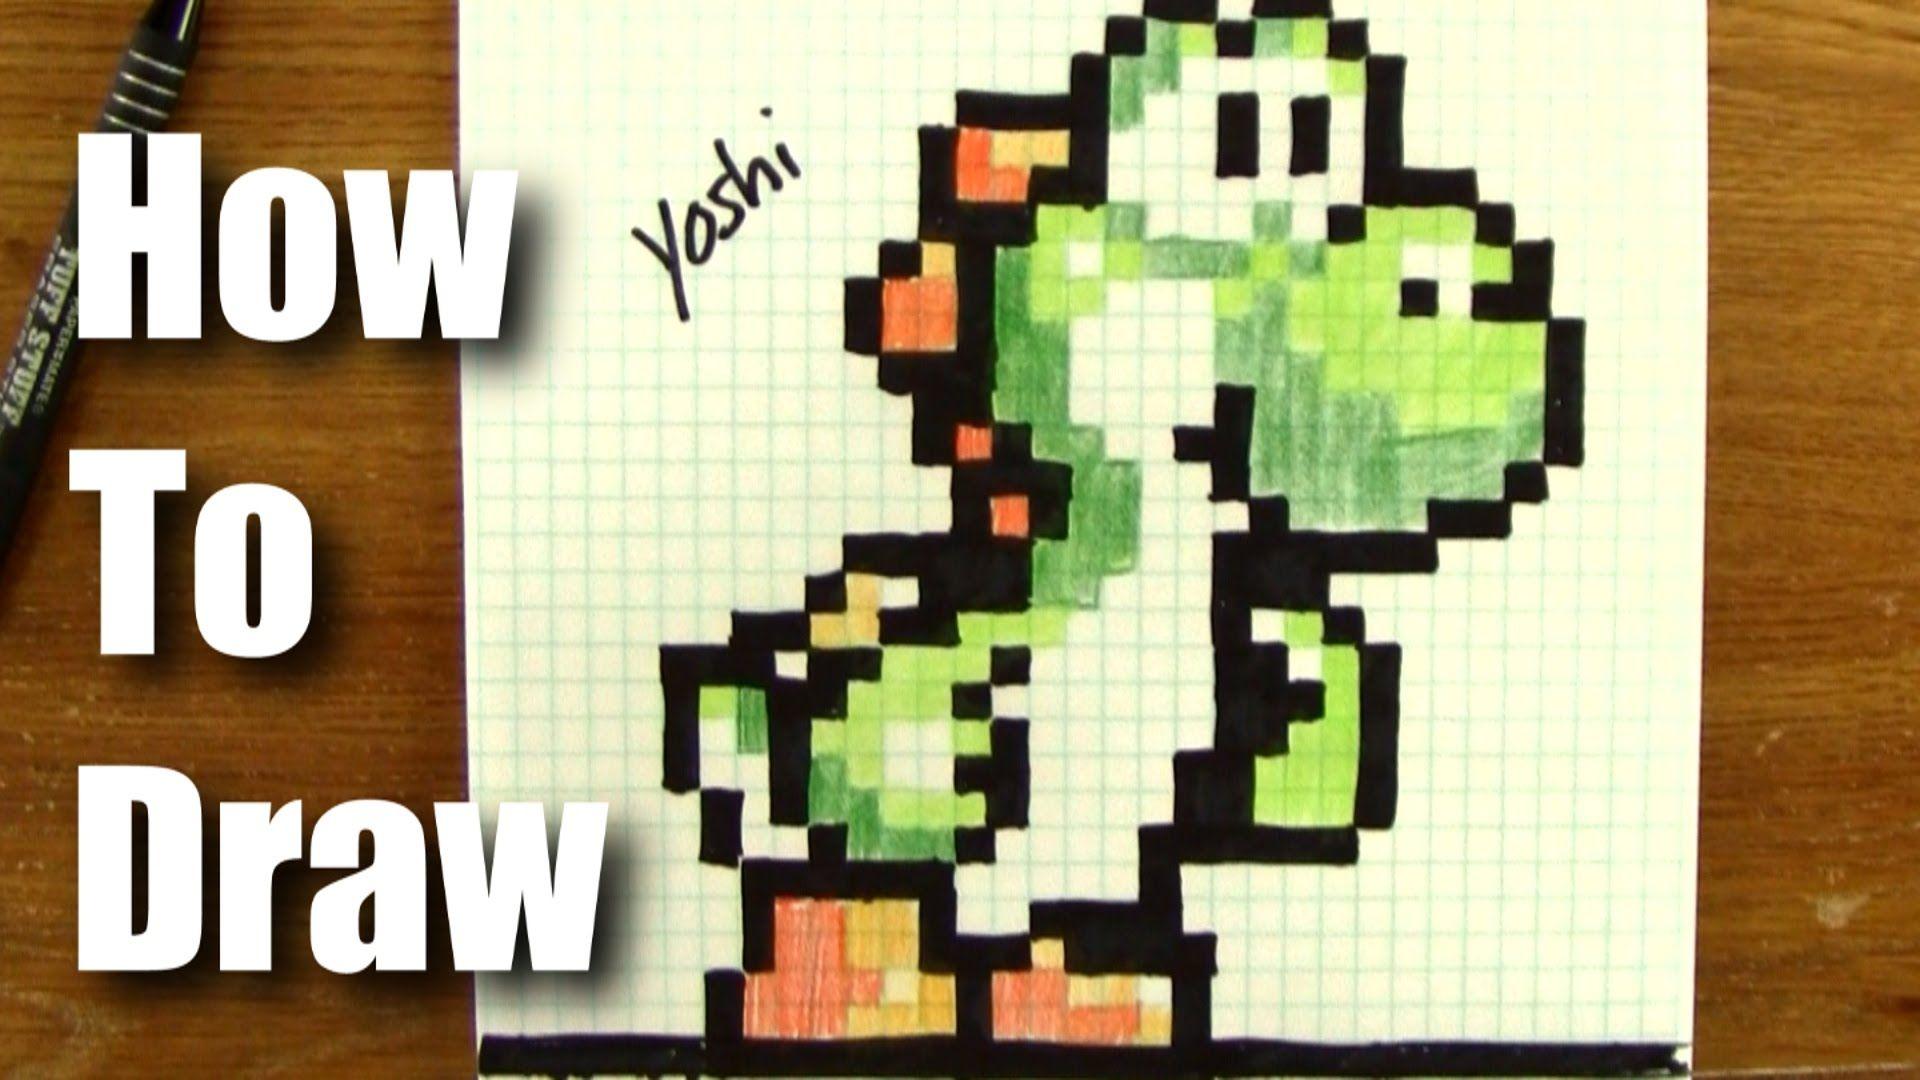 1920x1080 How To Draw 8 Bit Yoshi From Mario! 8 Bit Drawing